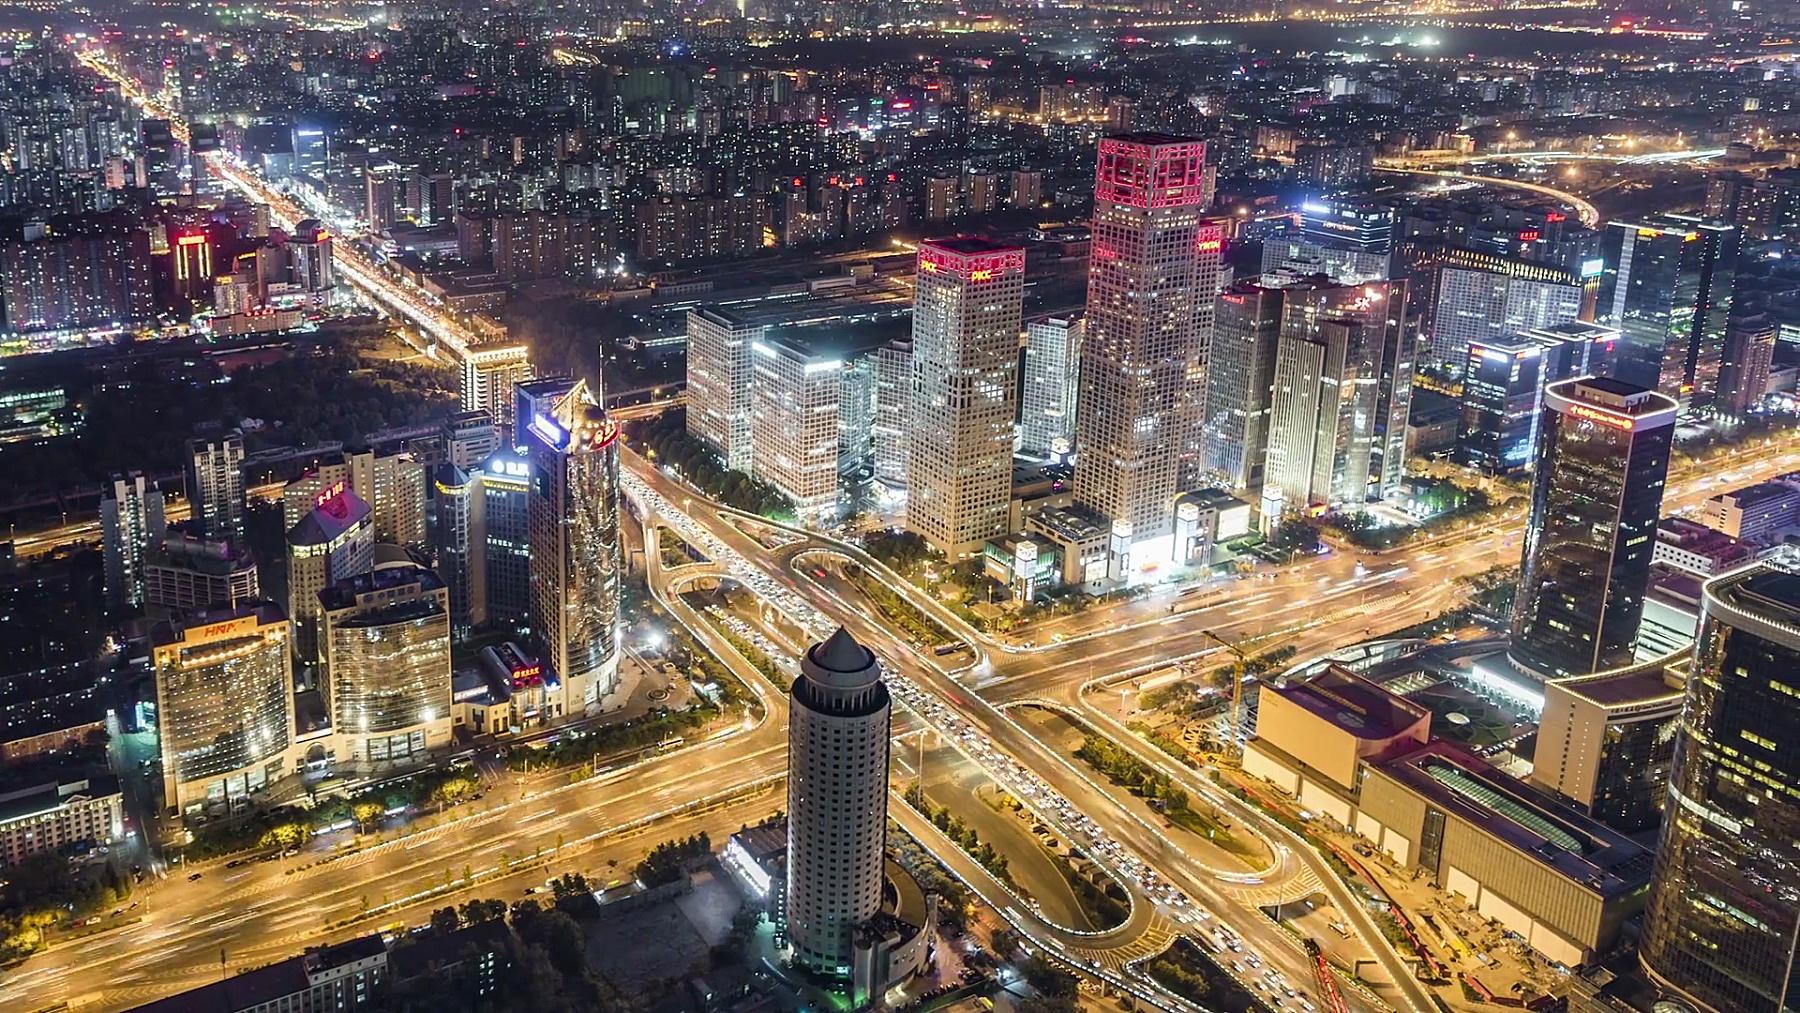 T/L MS HA PAN北京CBD区域鸟瞰/中国北京